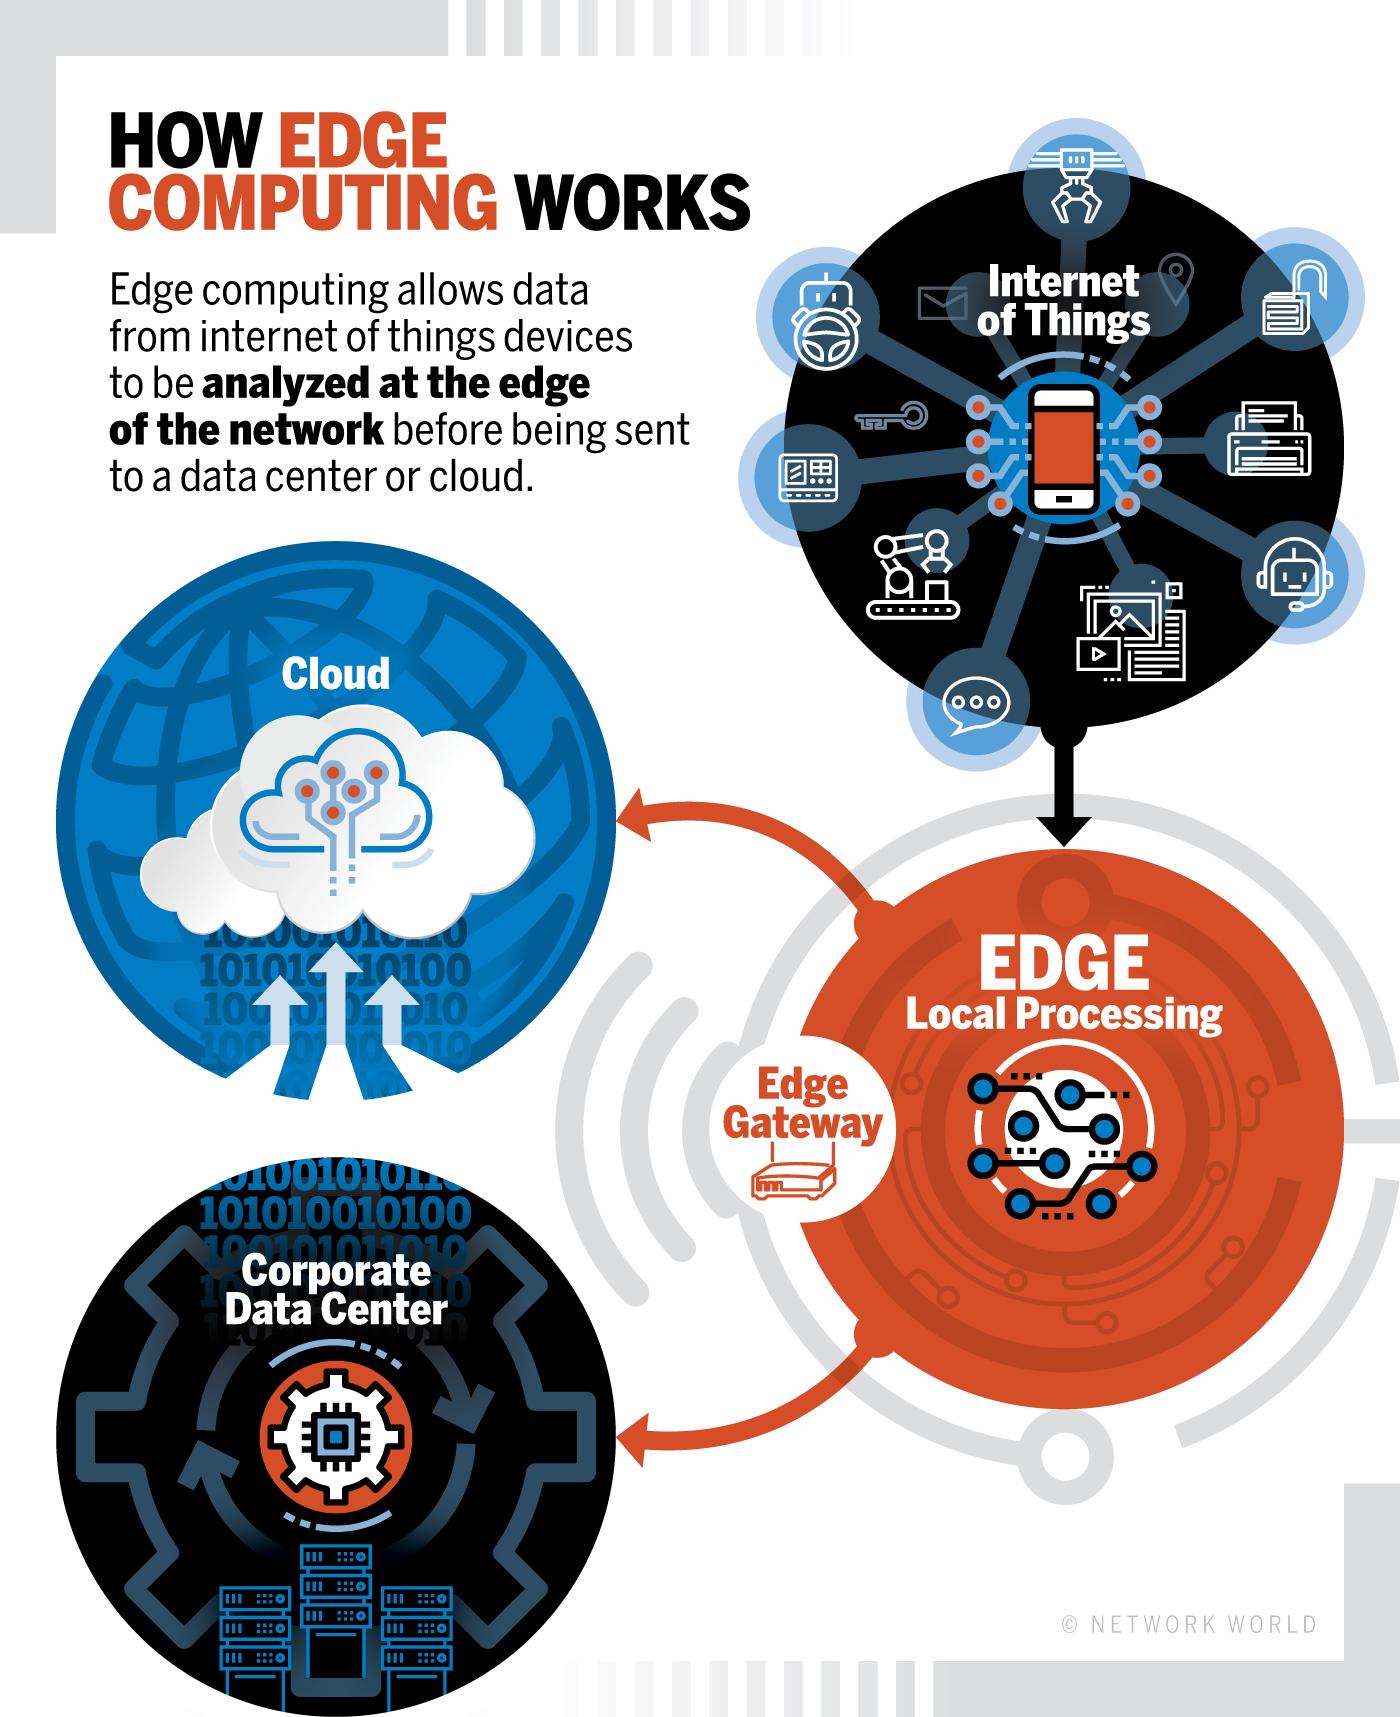 nw_how_edge_computing_works_diagram